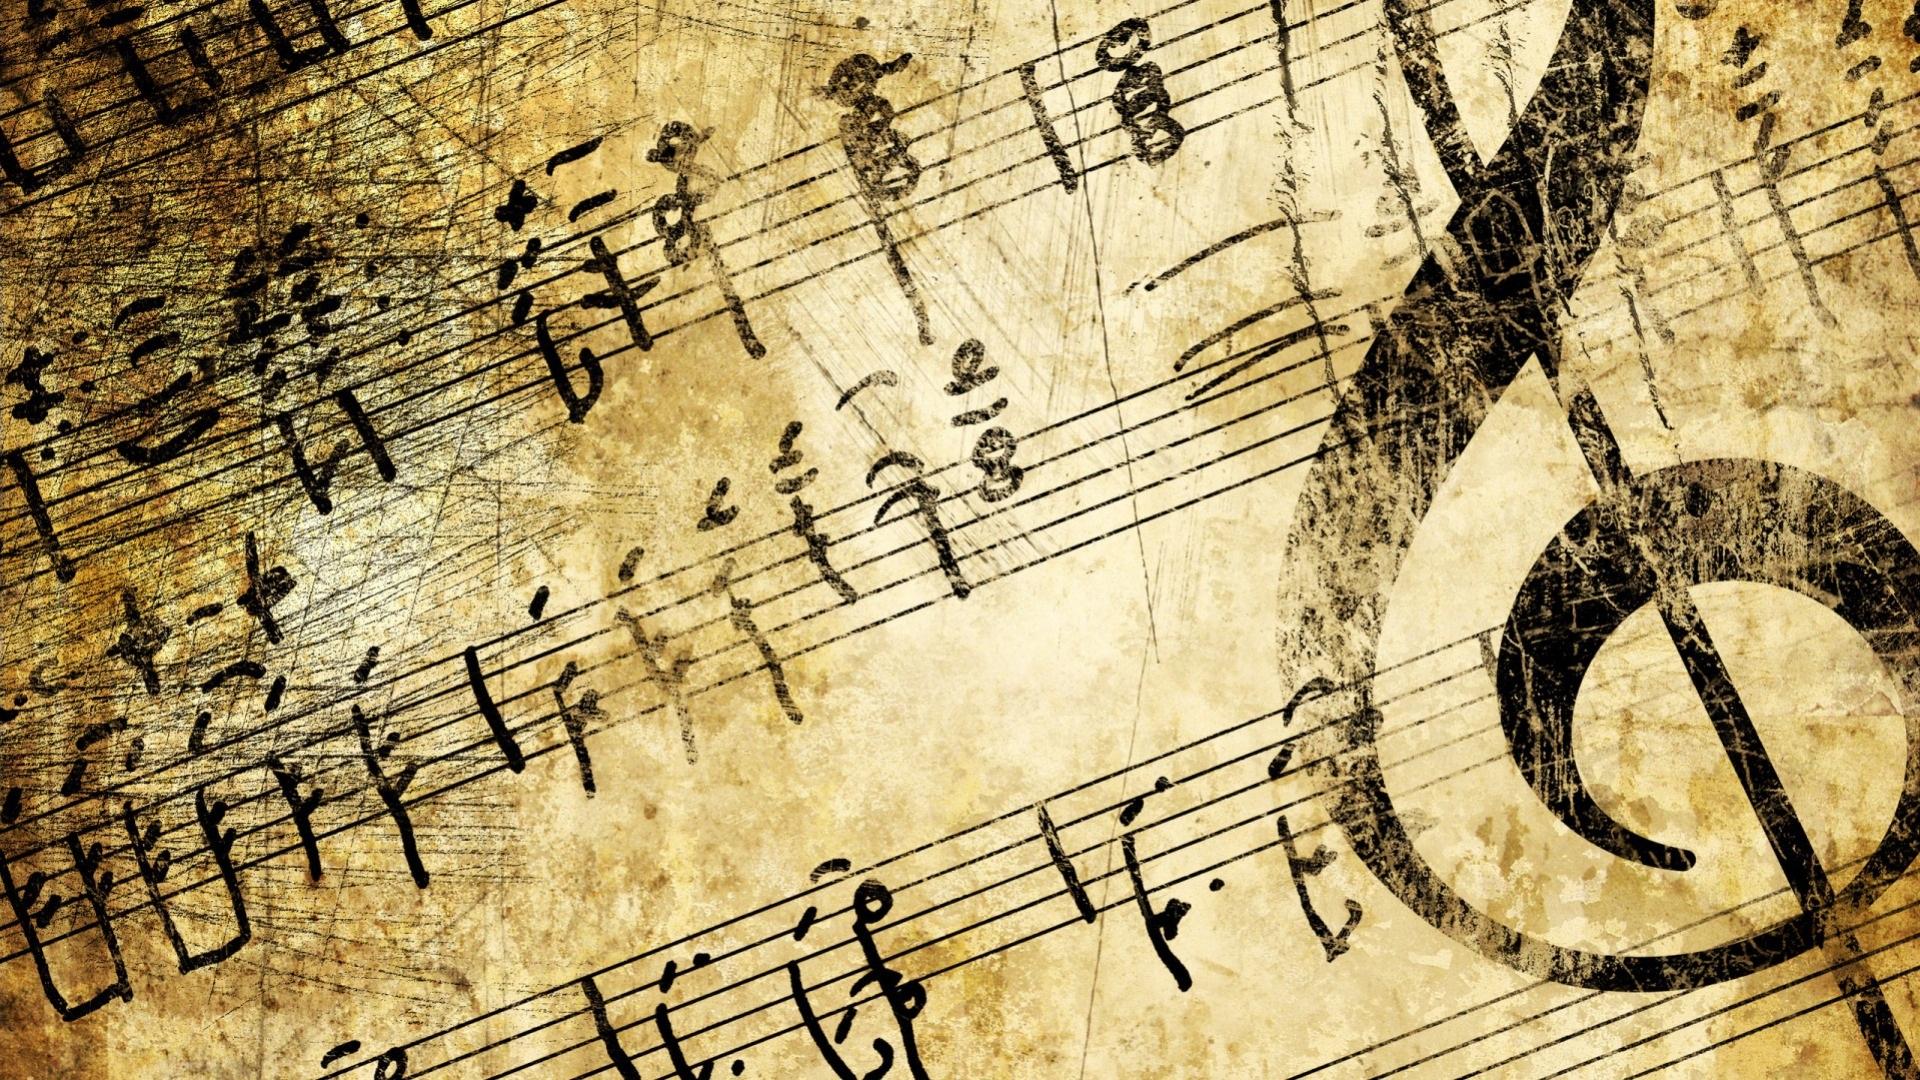 Classical Music Background Wallpaper Classical music wallpaper 1920x1080